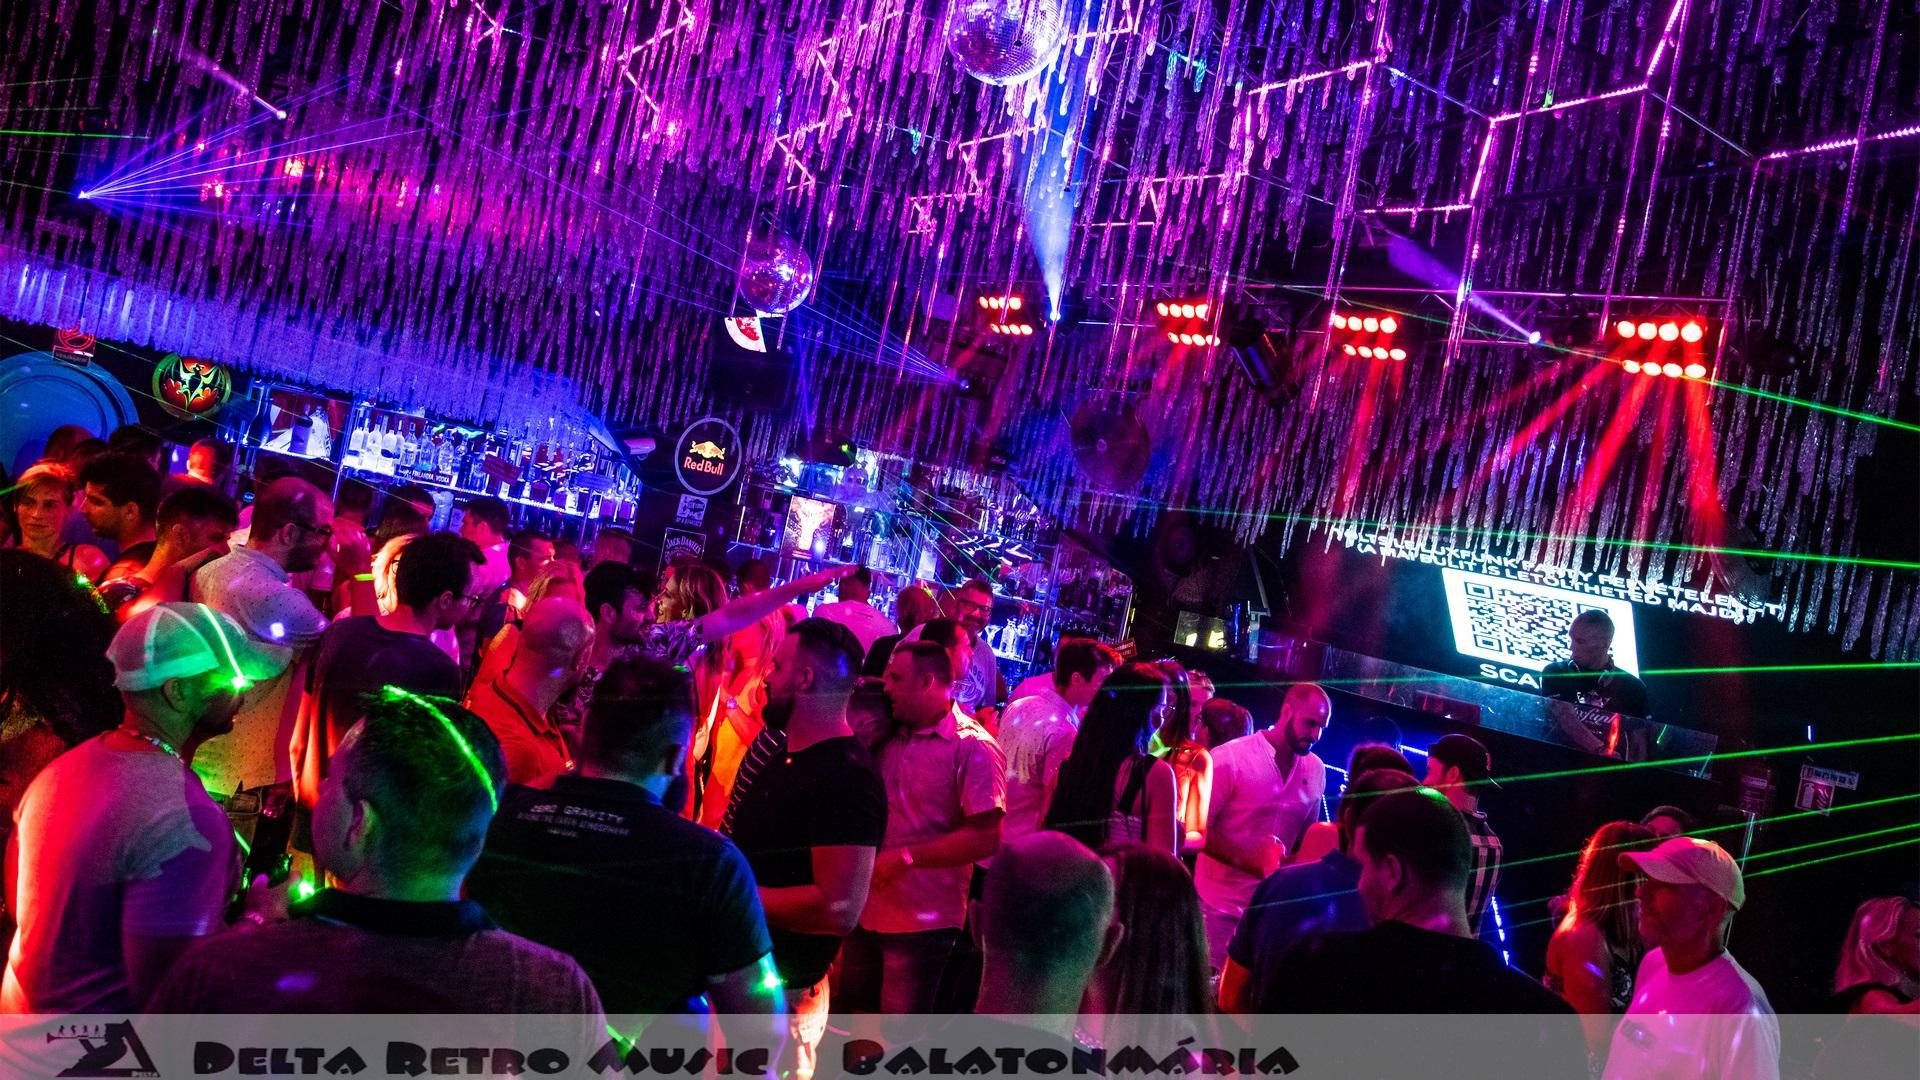 luxfunk-radio-funky-party_200807_delta retro-music-factory_006